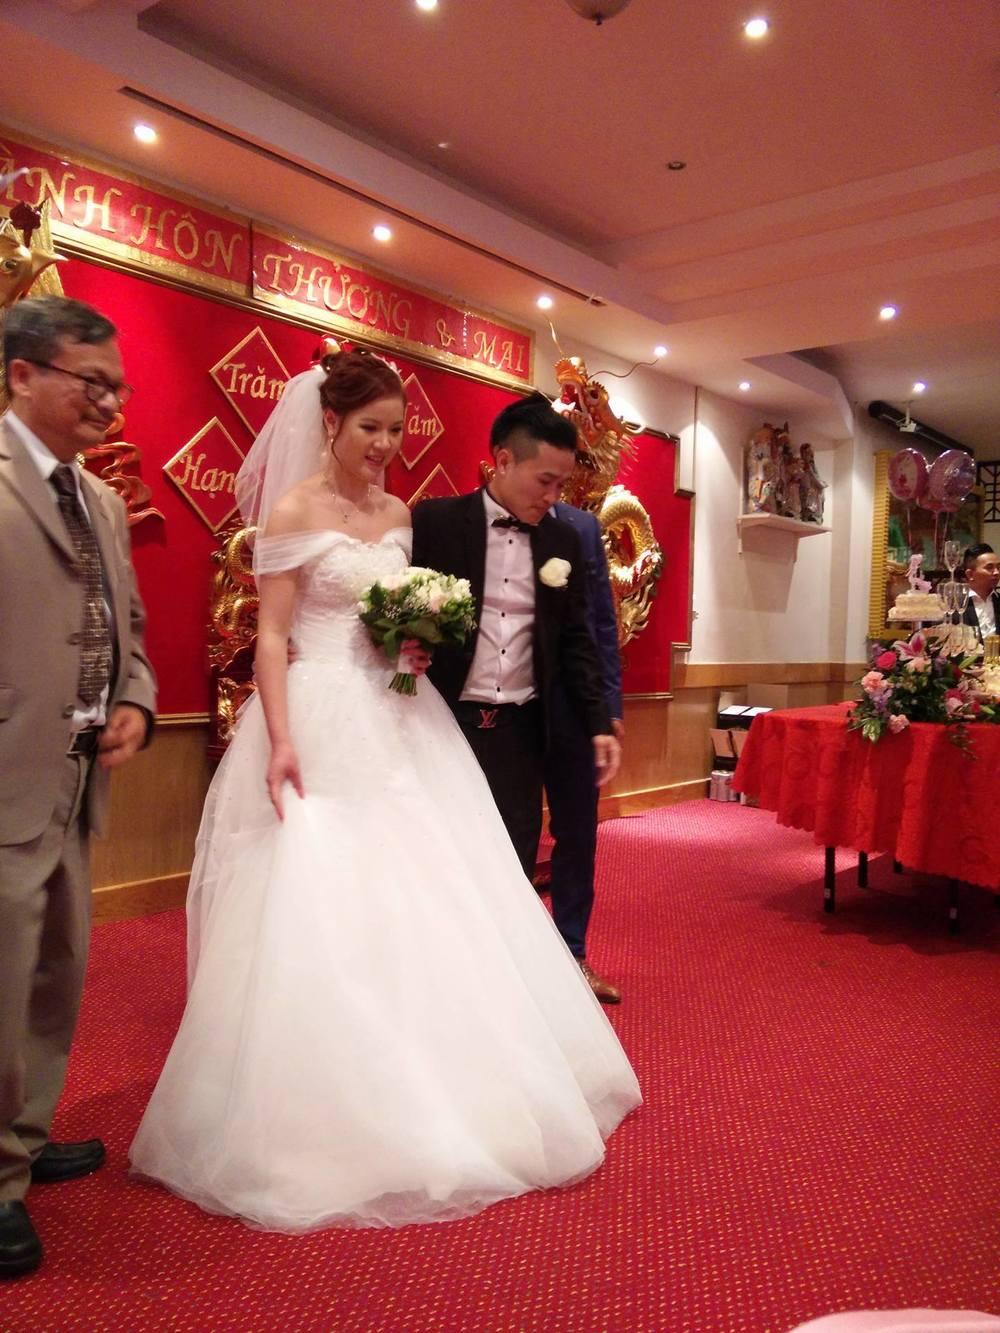 Superpeachlife blog - wedding